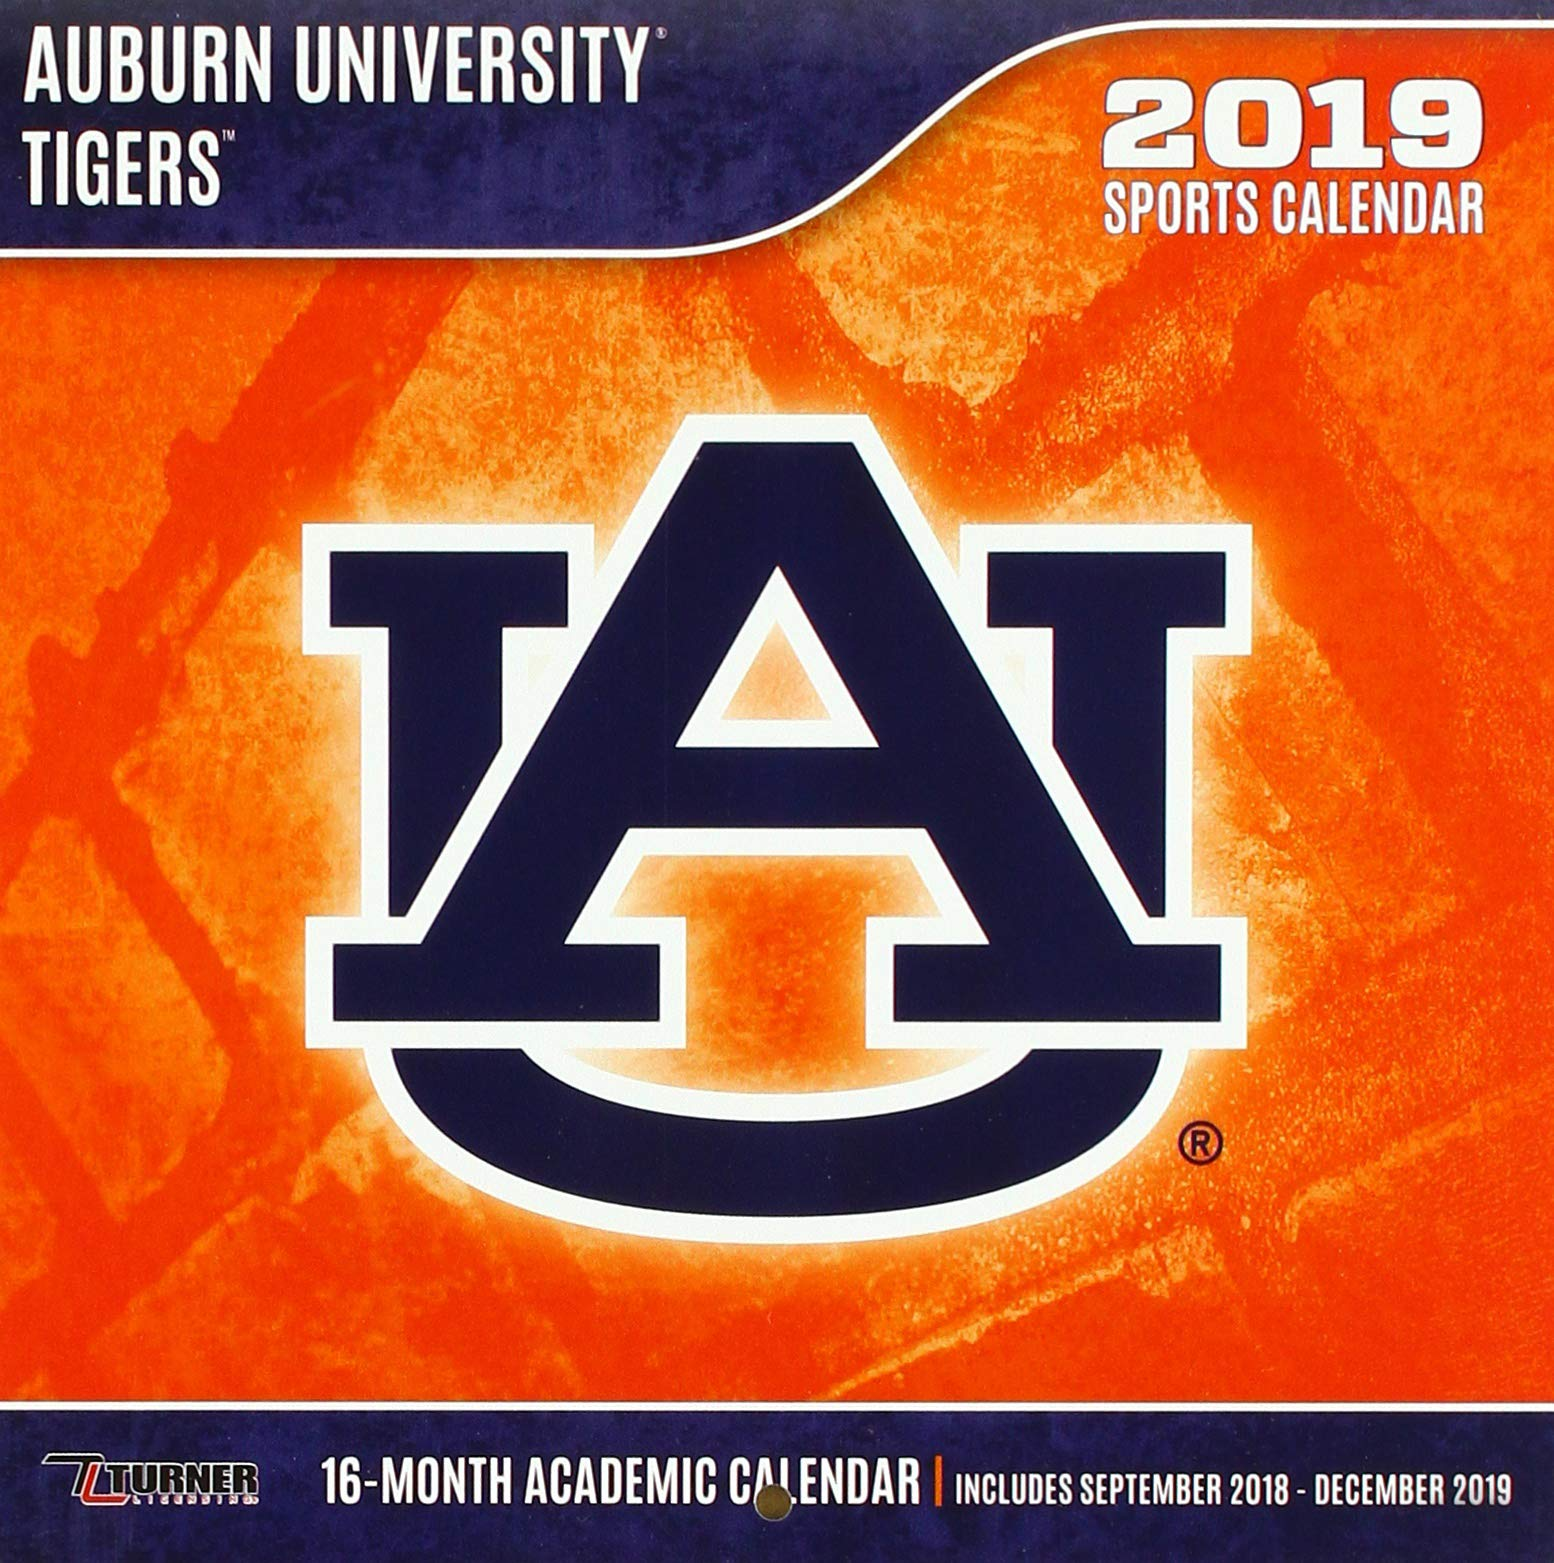 Auburn University 2019 Calendar Auburn Tigers 2019 Calendar: Lang Holdings Inc.: 9781469356303